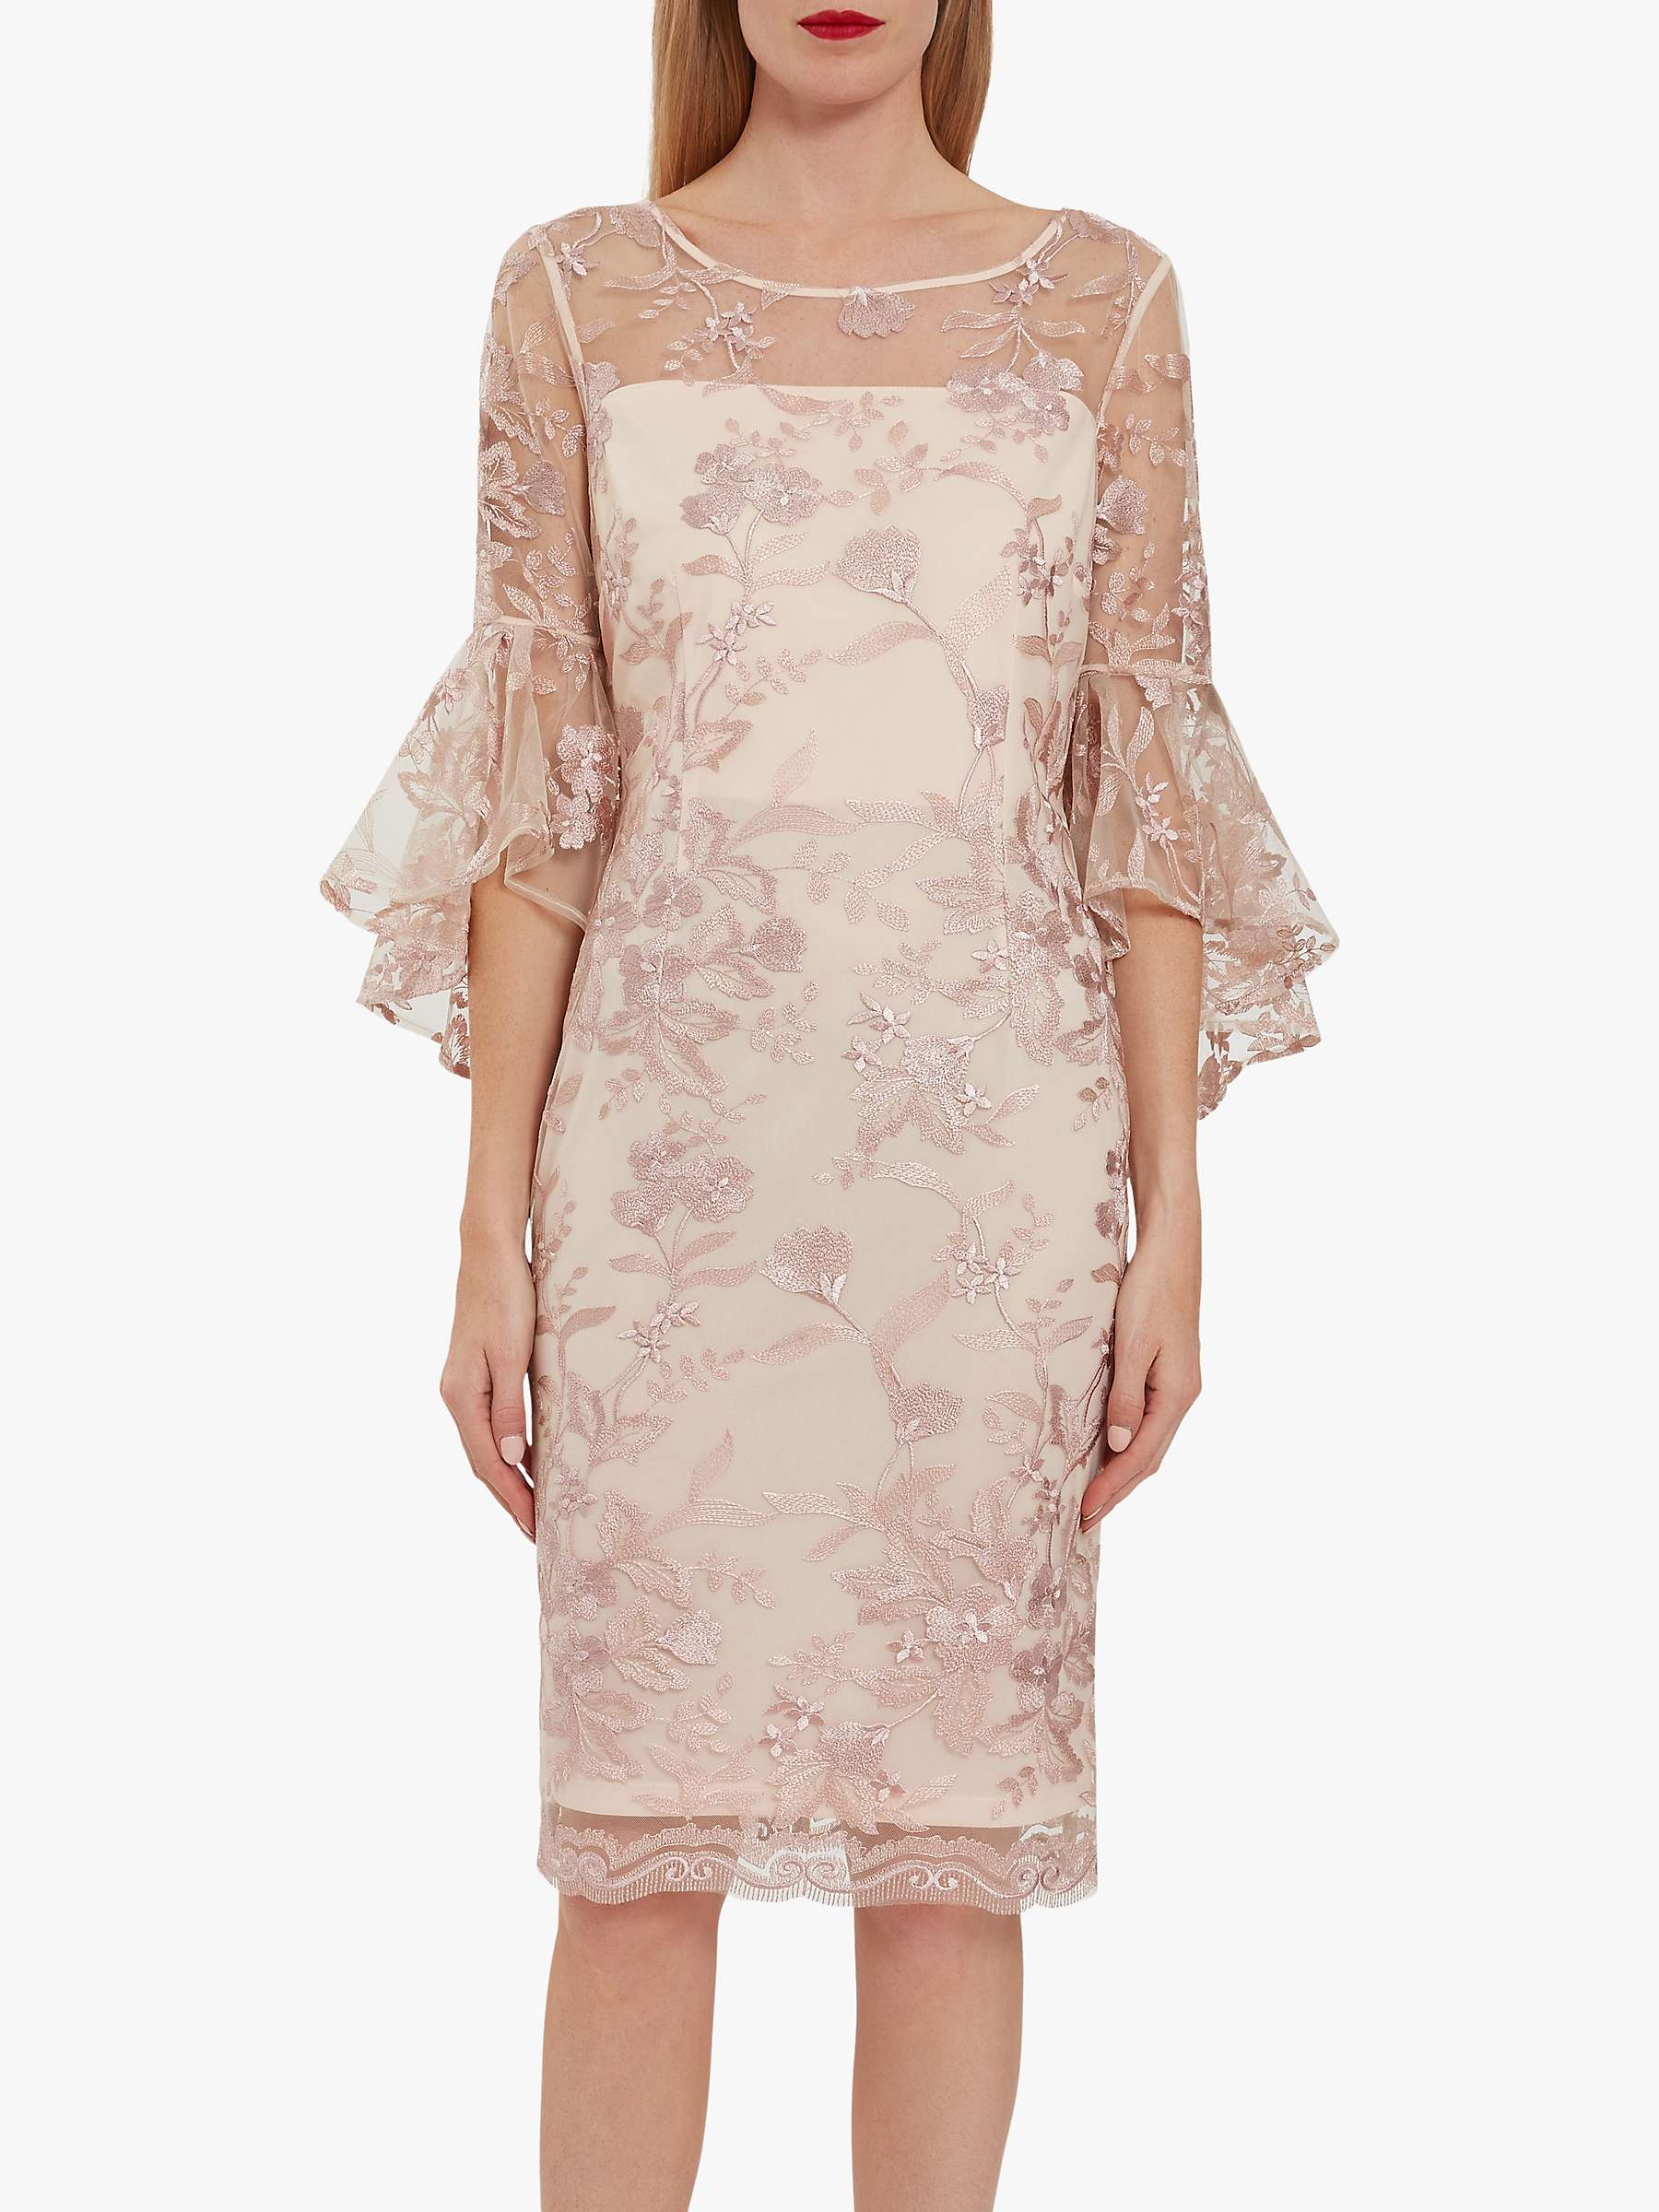 Gina Bacconi Dresses | Shop Gina